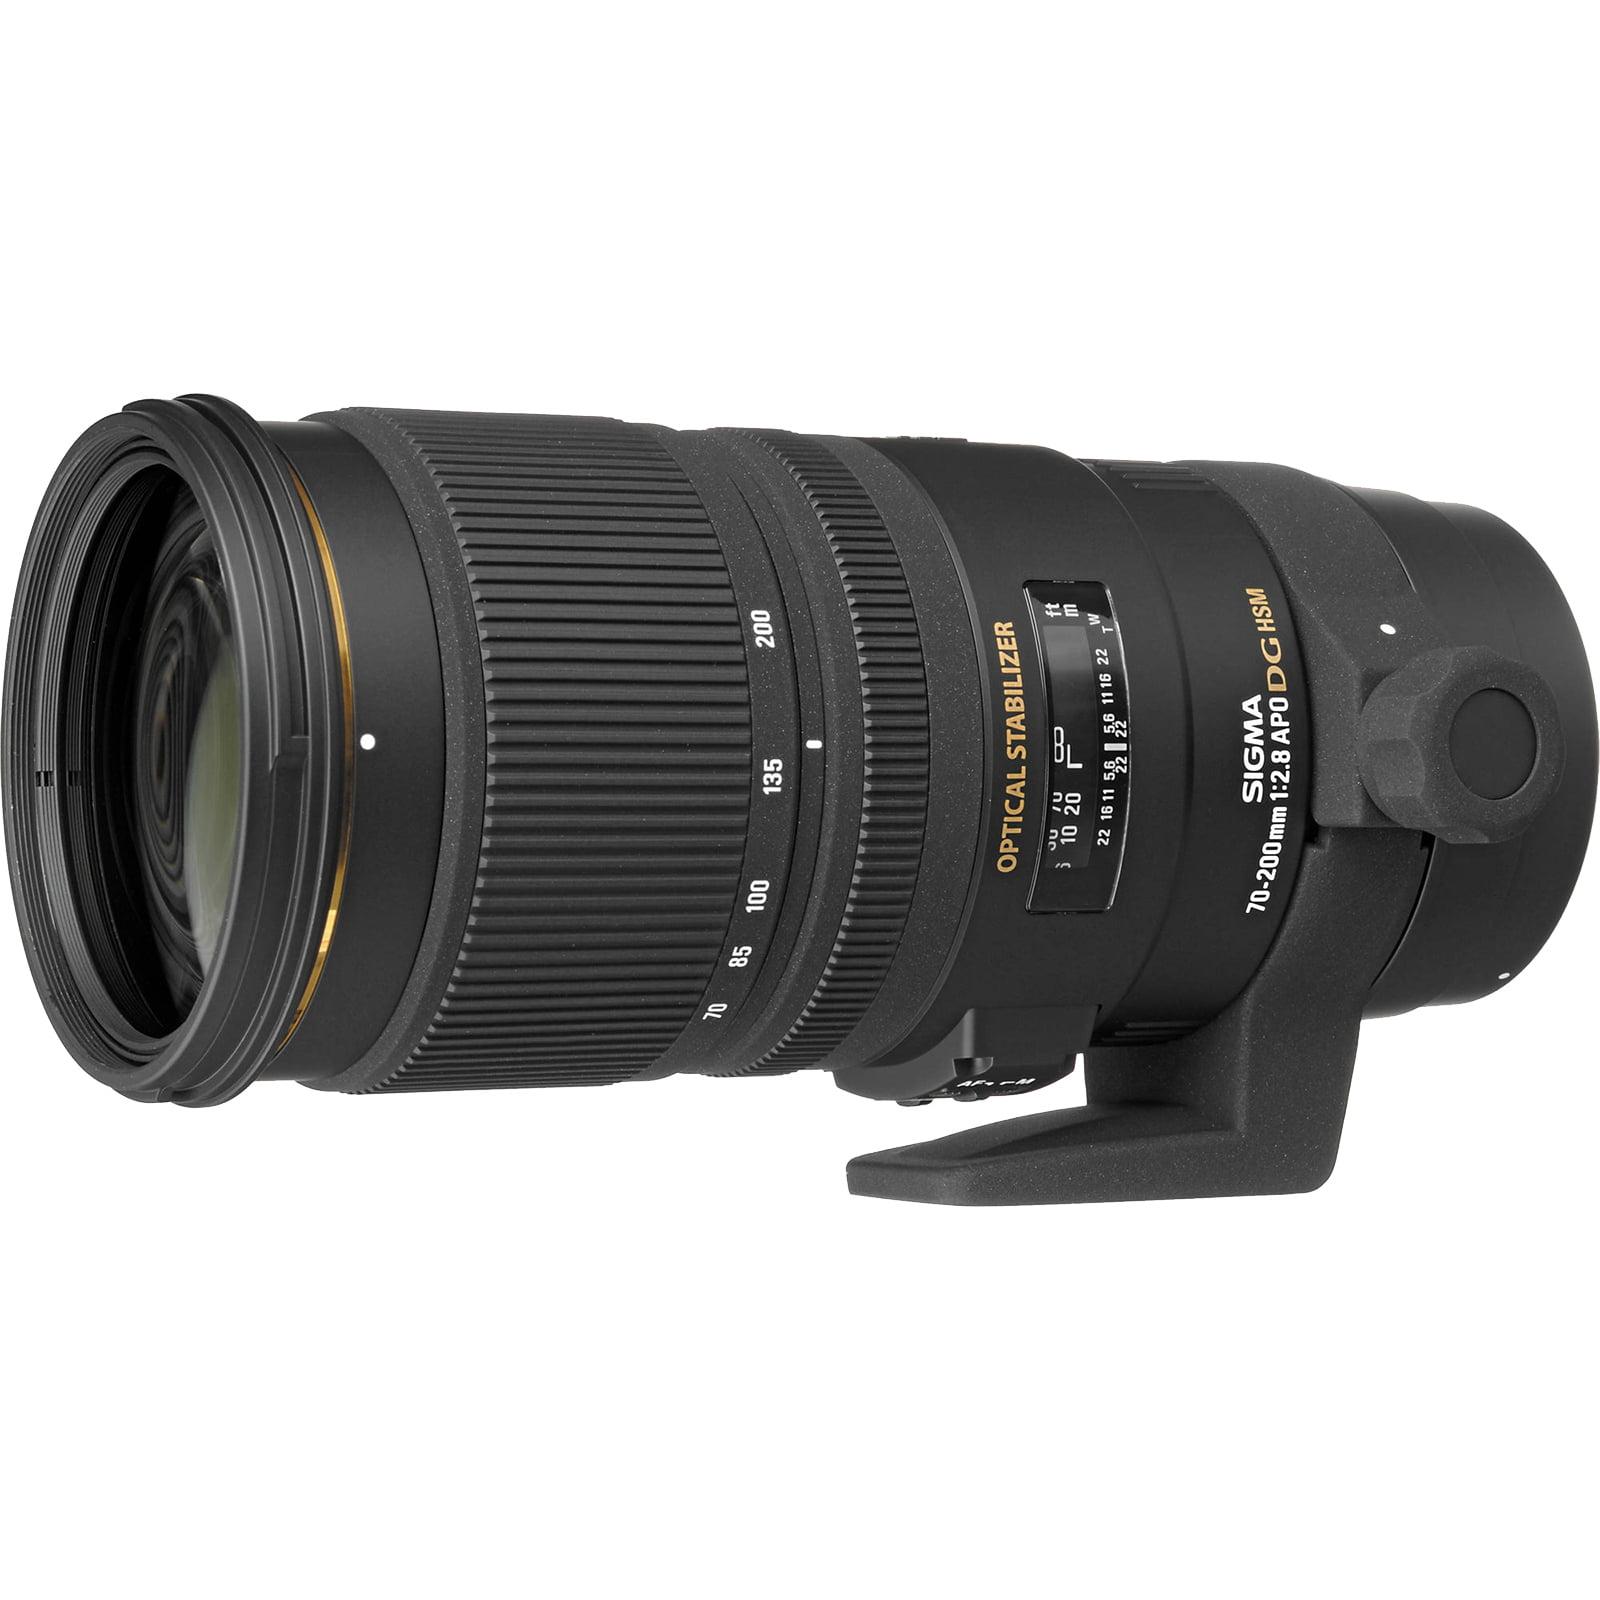 Sigma 70-200mm F2.8 EX DG HSM OS Lens For Nikon 589306